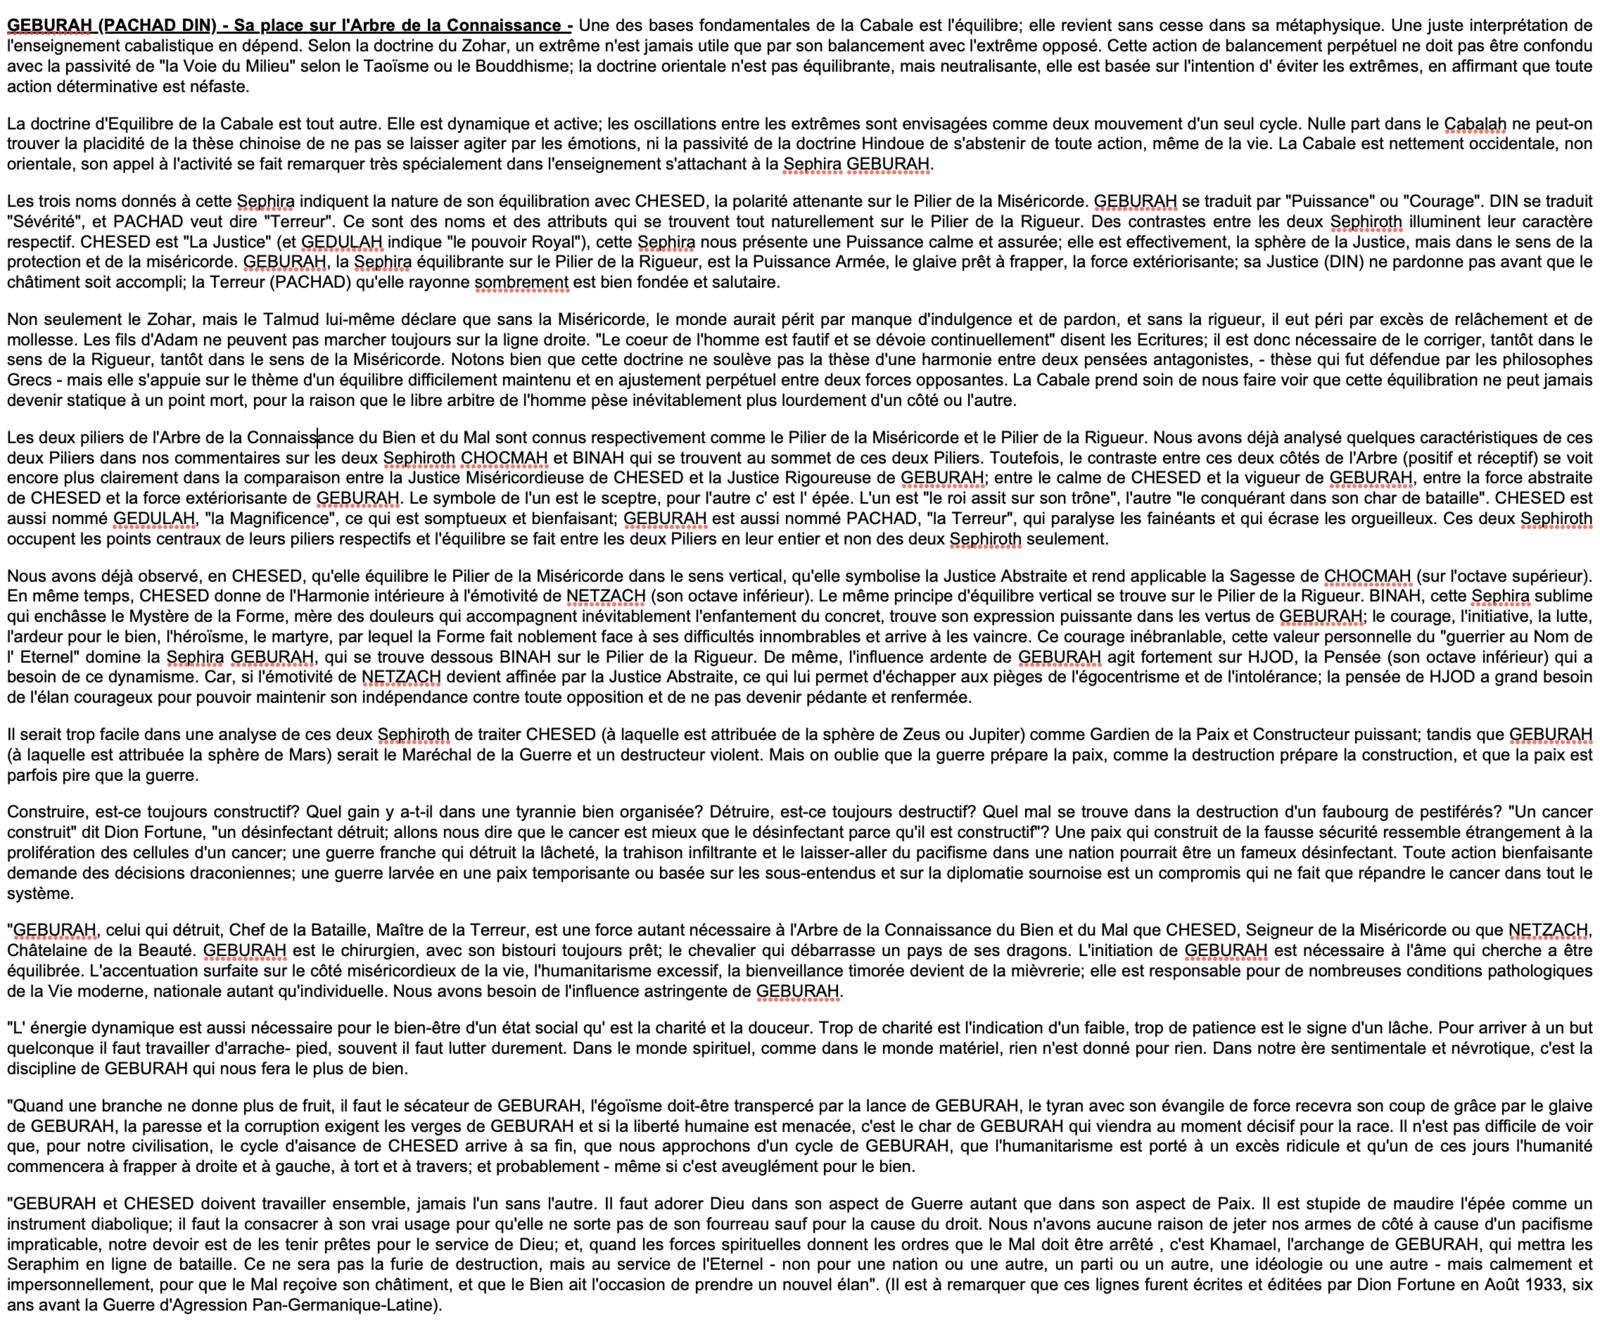 Francis ROLT-WHEELER Ph.D. - GEBURAH (PACHAD DIN) (1).